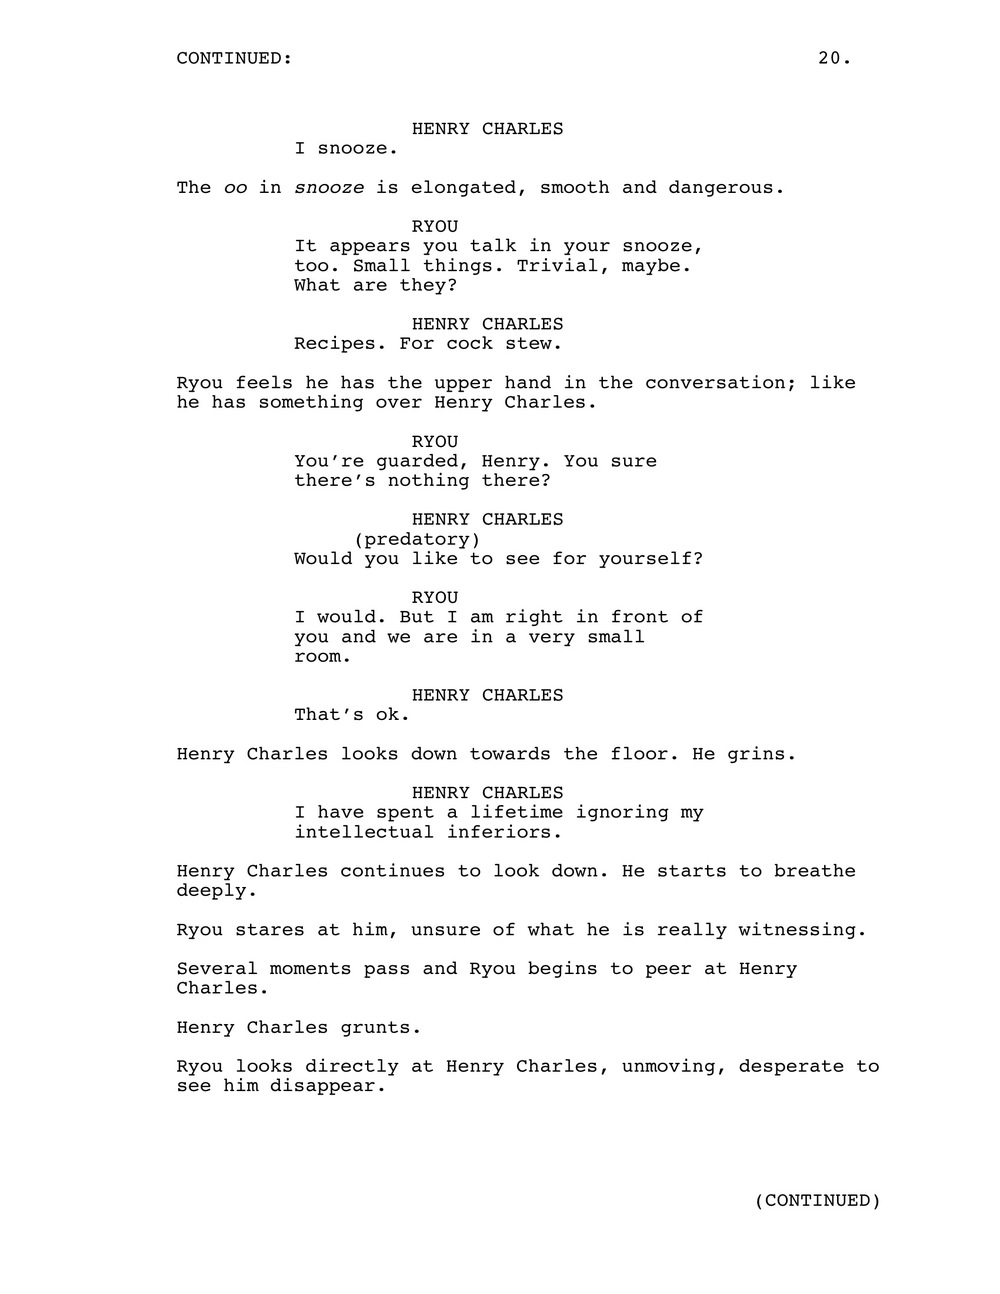 'Introducing Henry Charles' (Pilot) by Alexander Craig | 20.jpeg